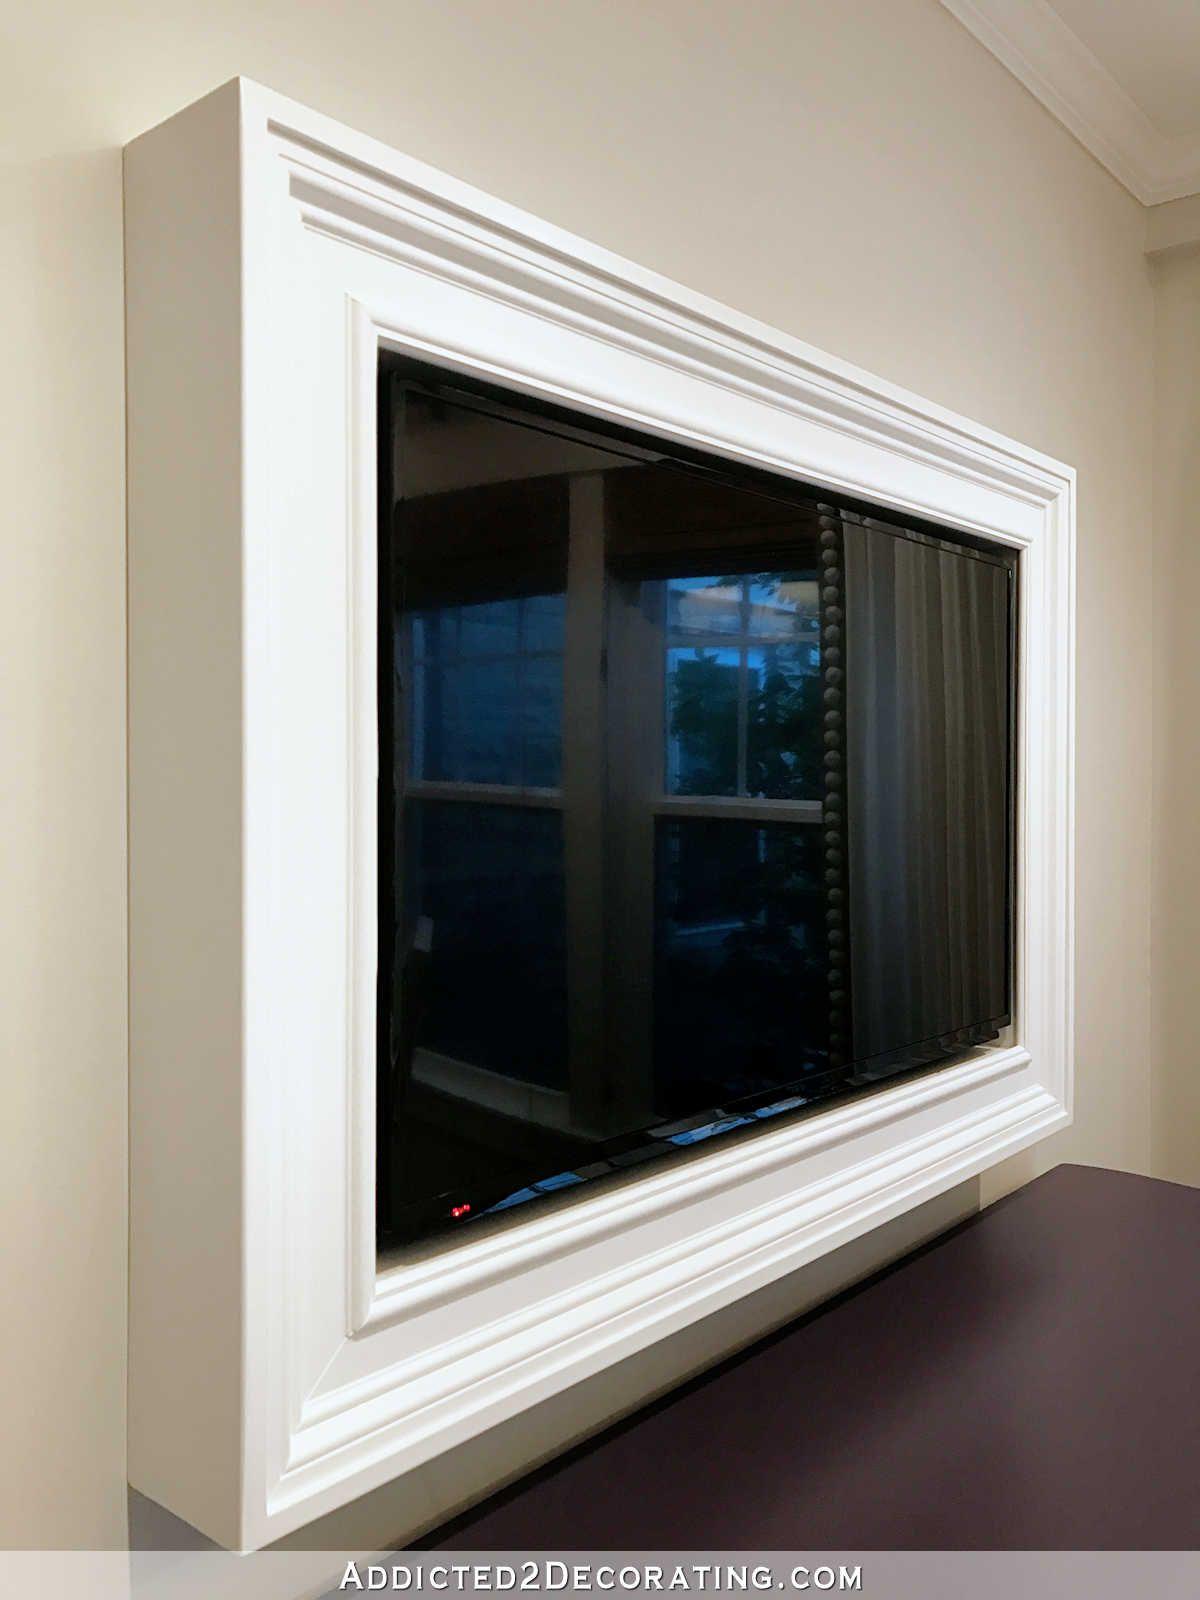 Custom Diy Frame For Wall Mounted Tv Finished Framed Tv Decor